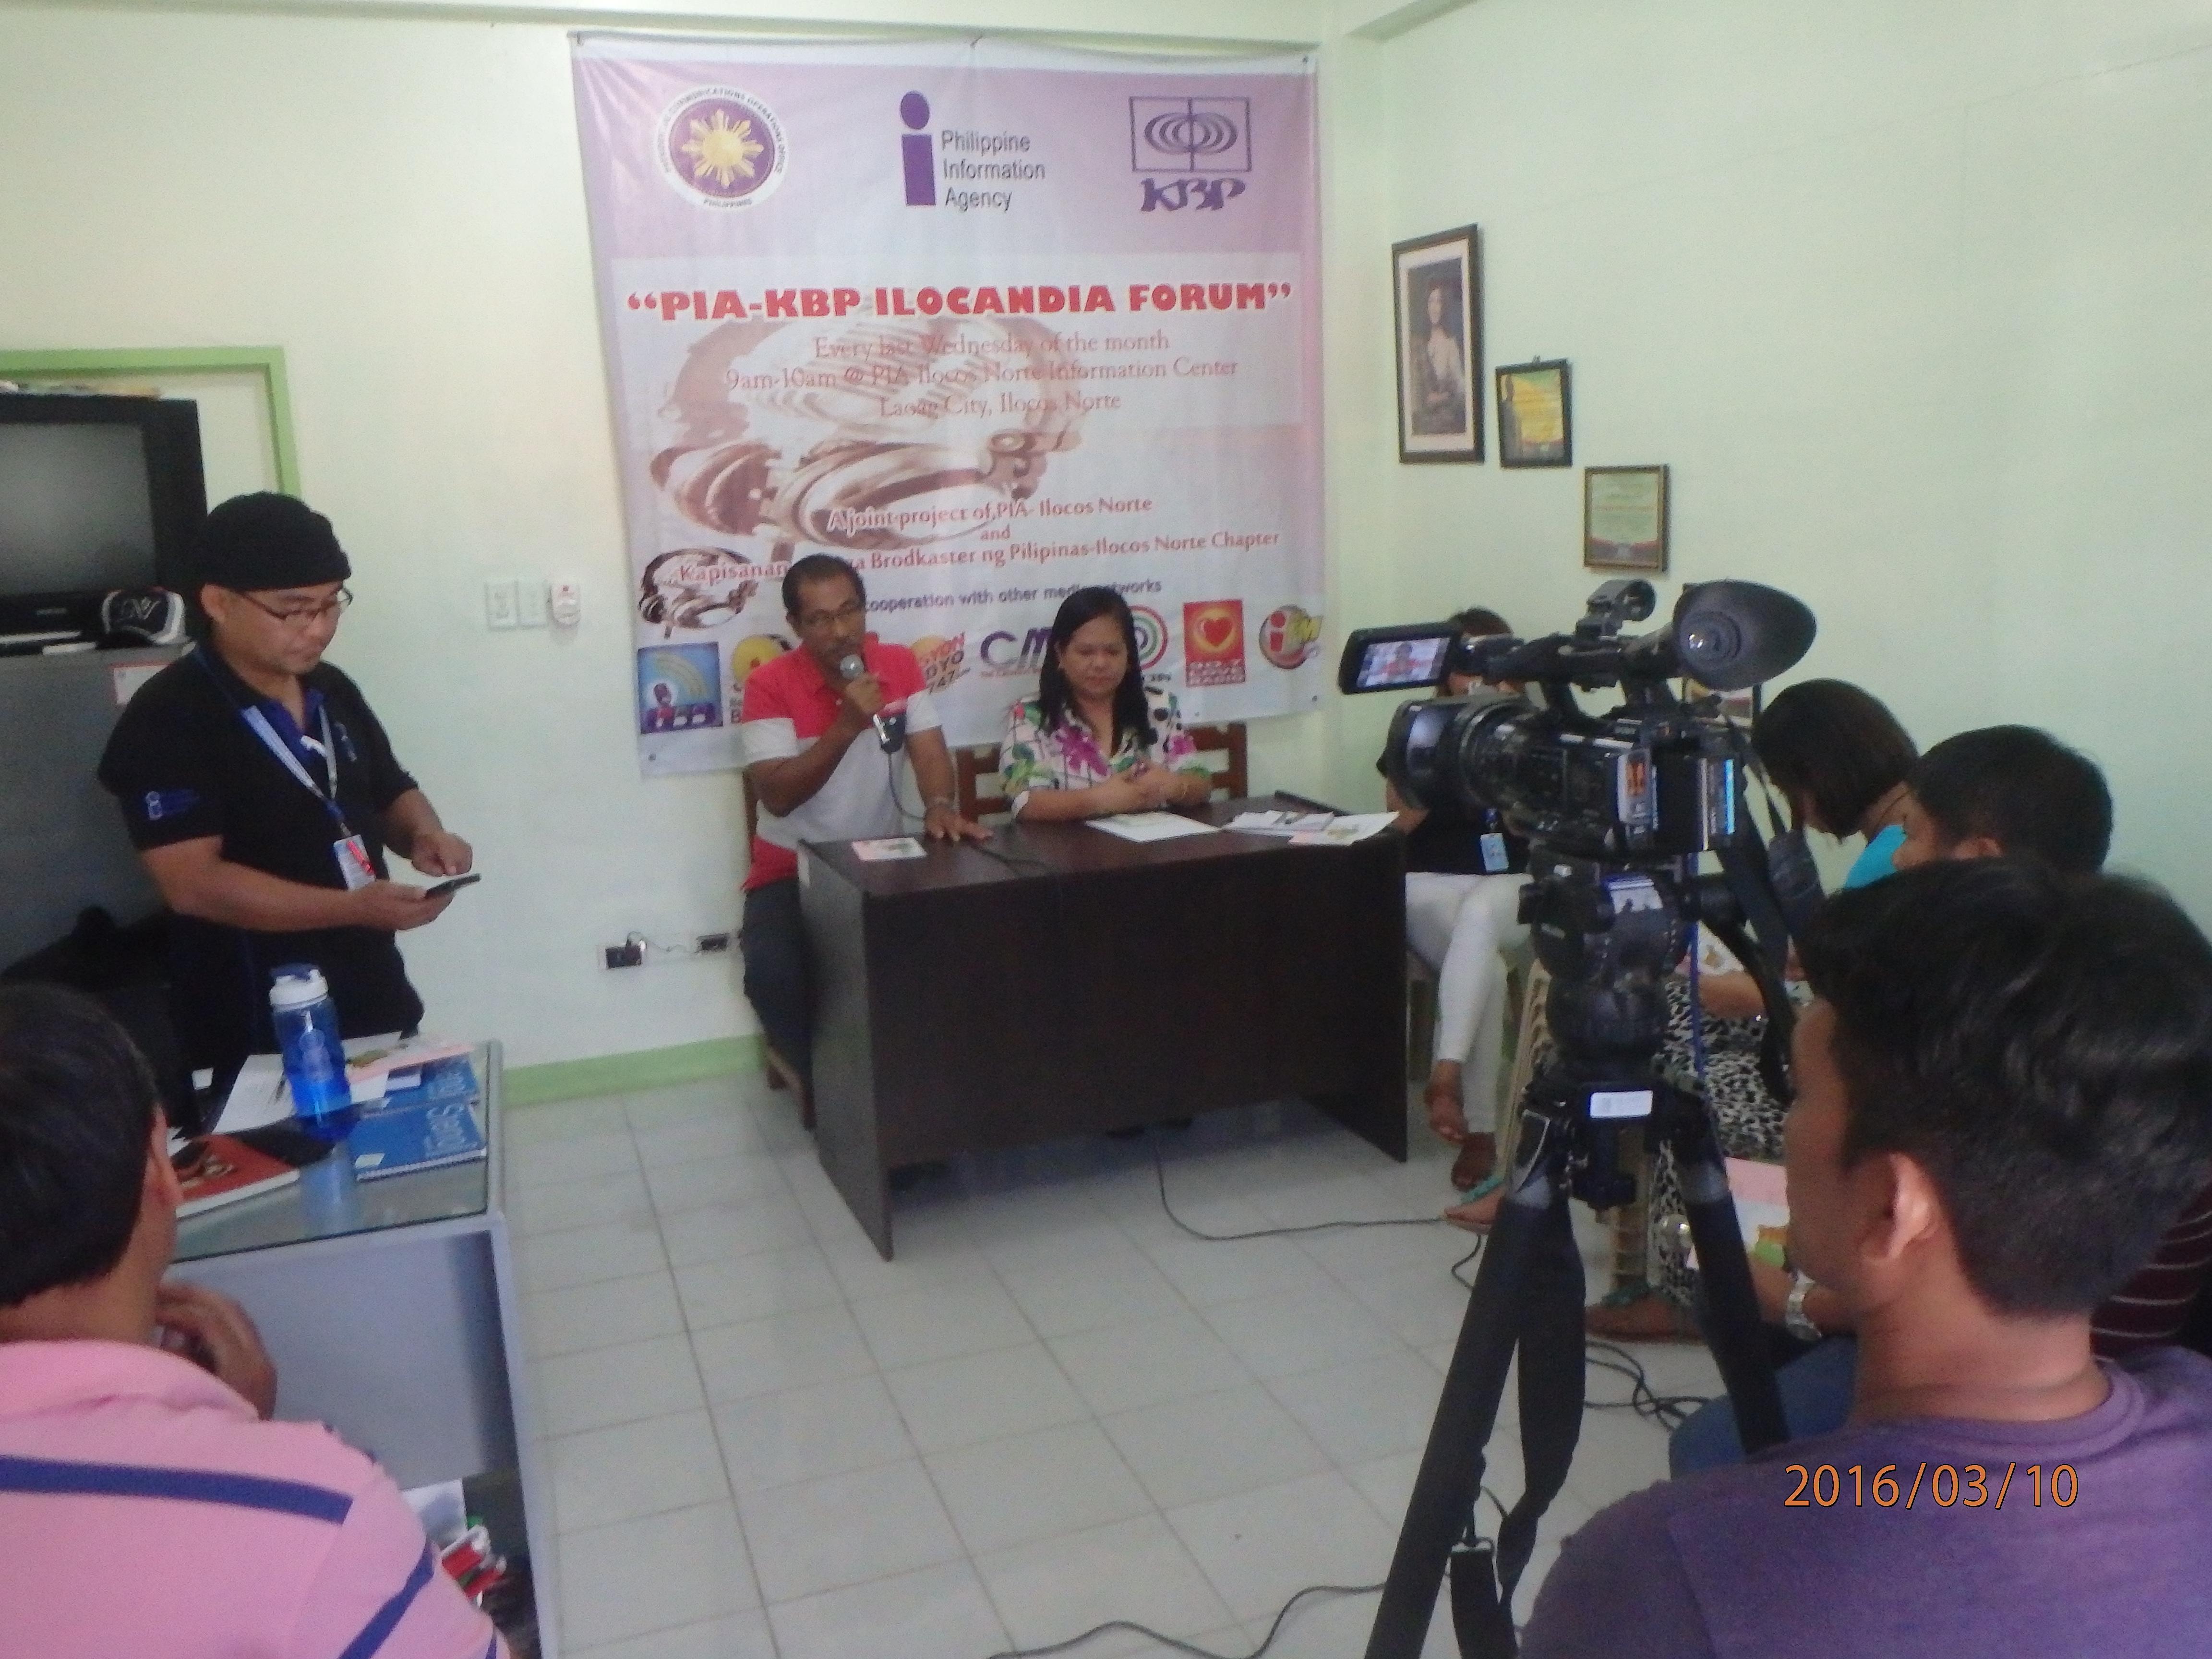 unfair labor practice in the philippines